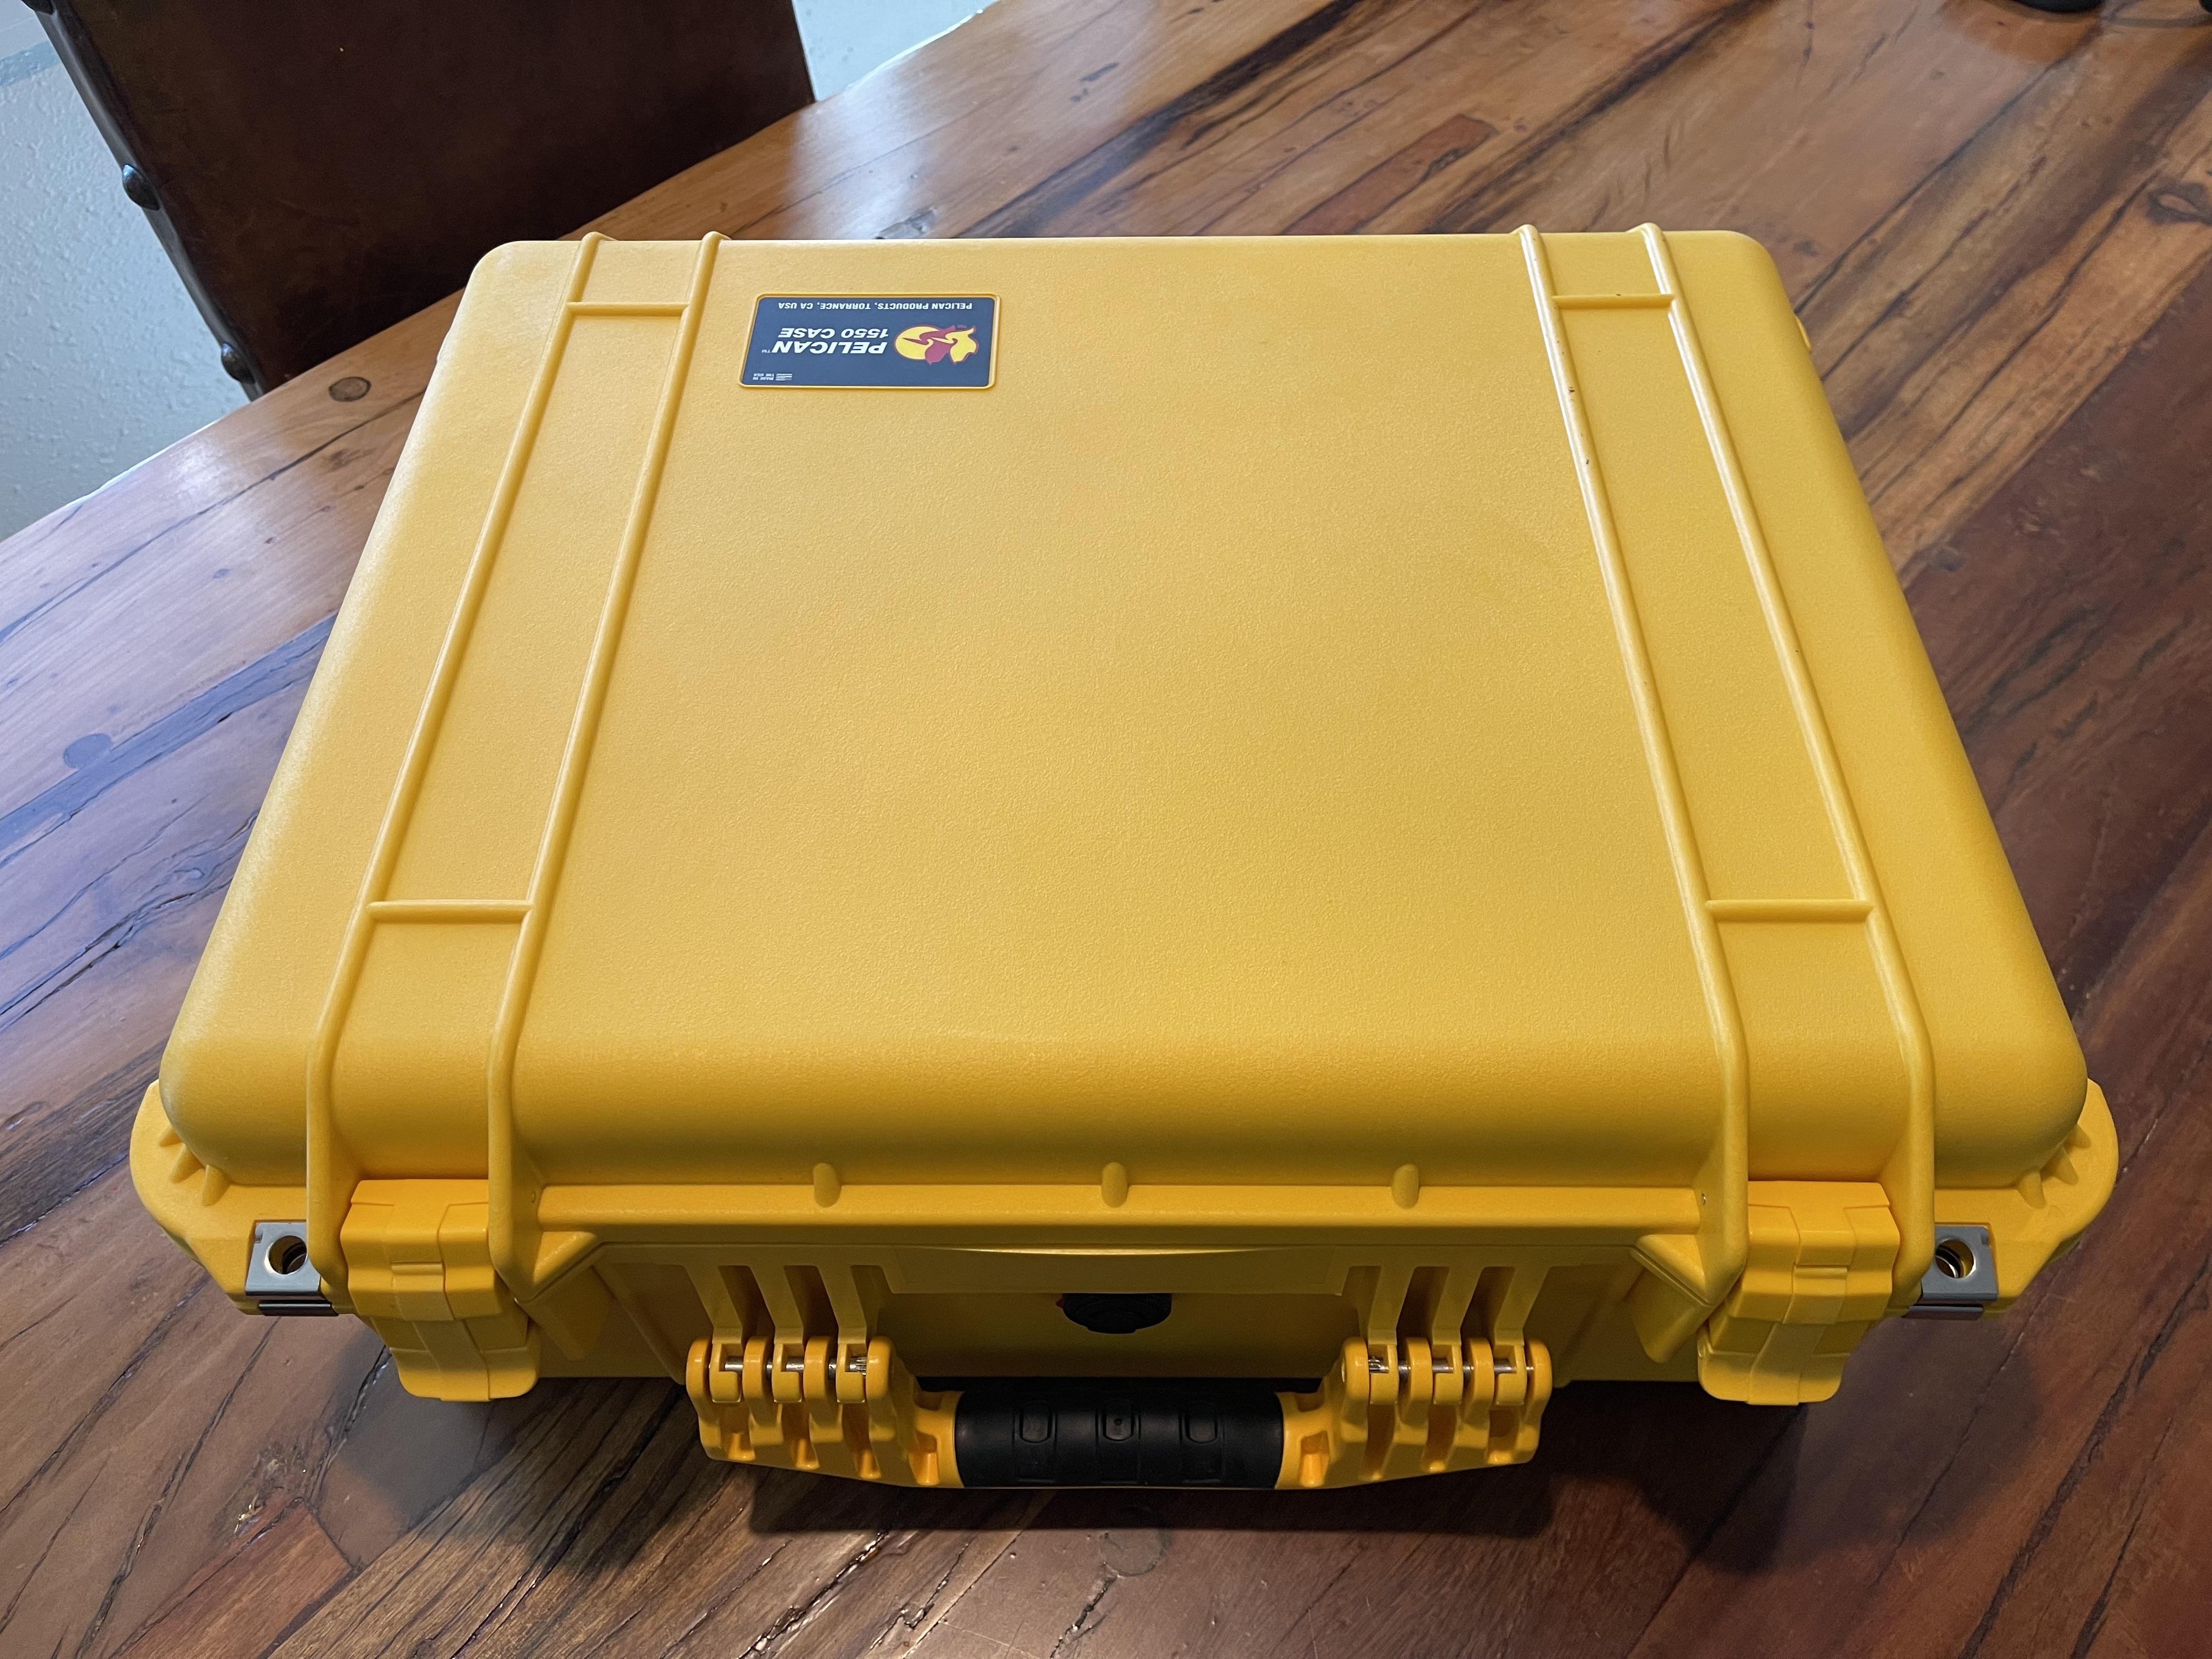 Sony A1 1550 Pelican10